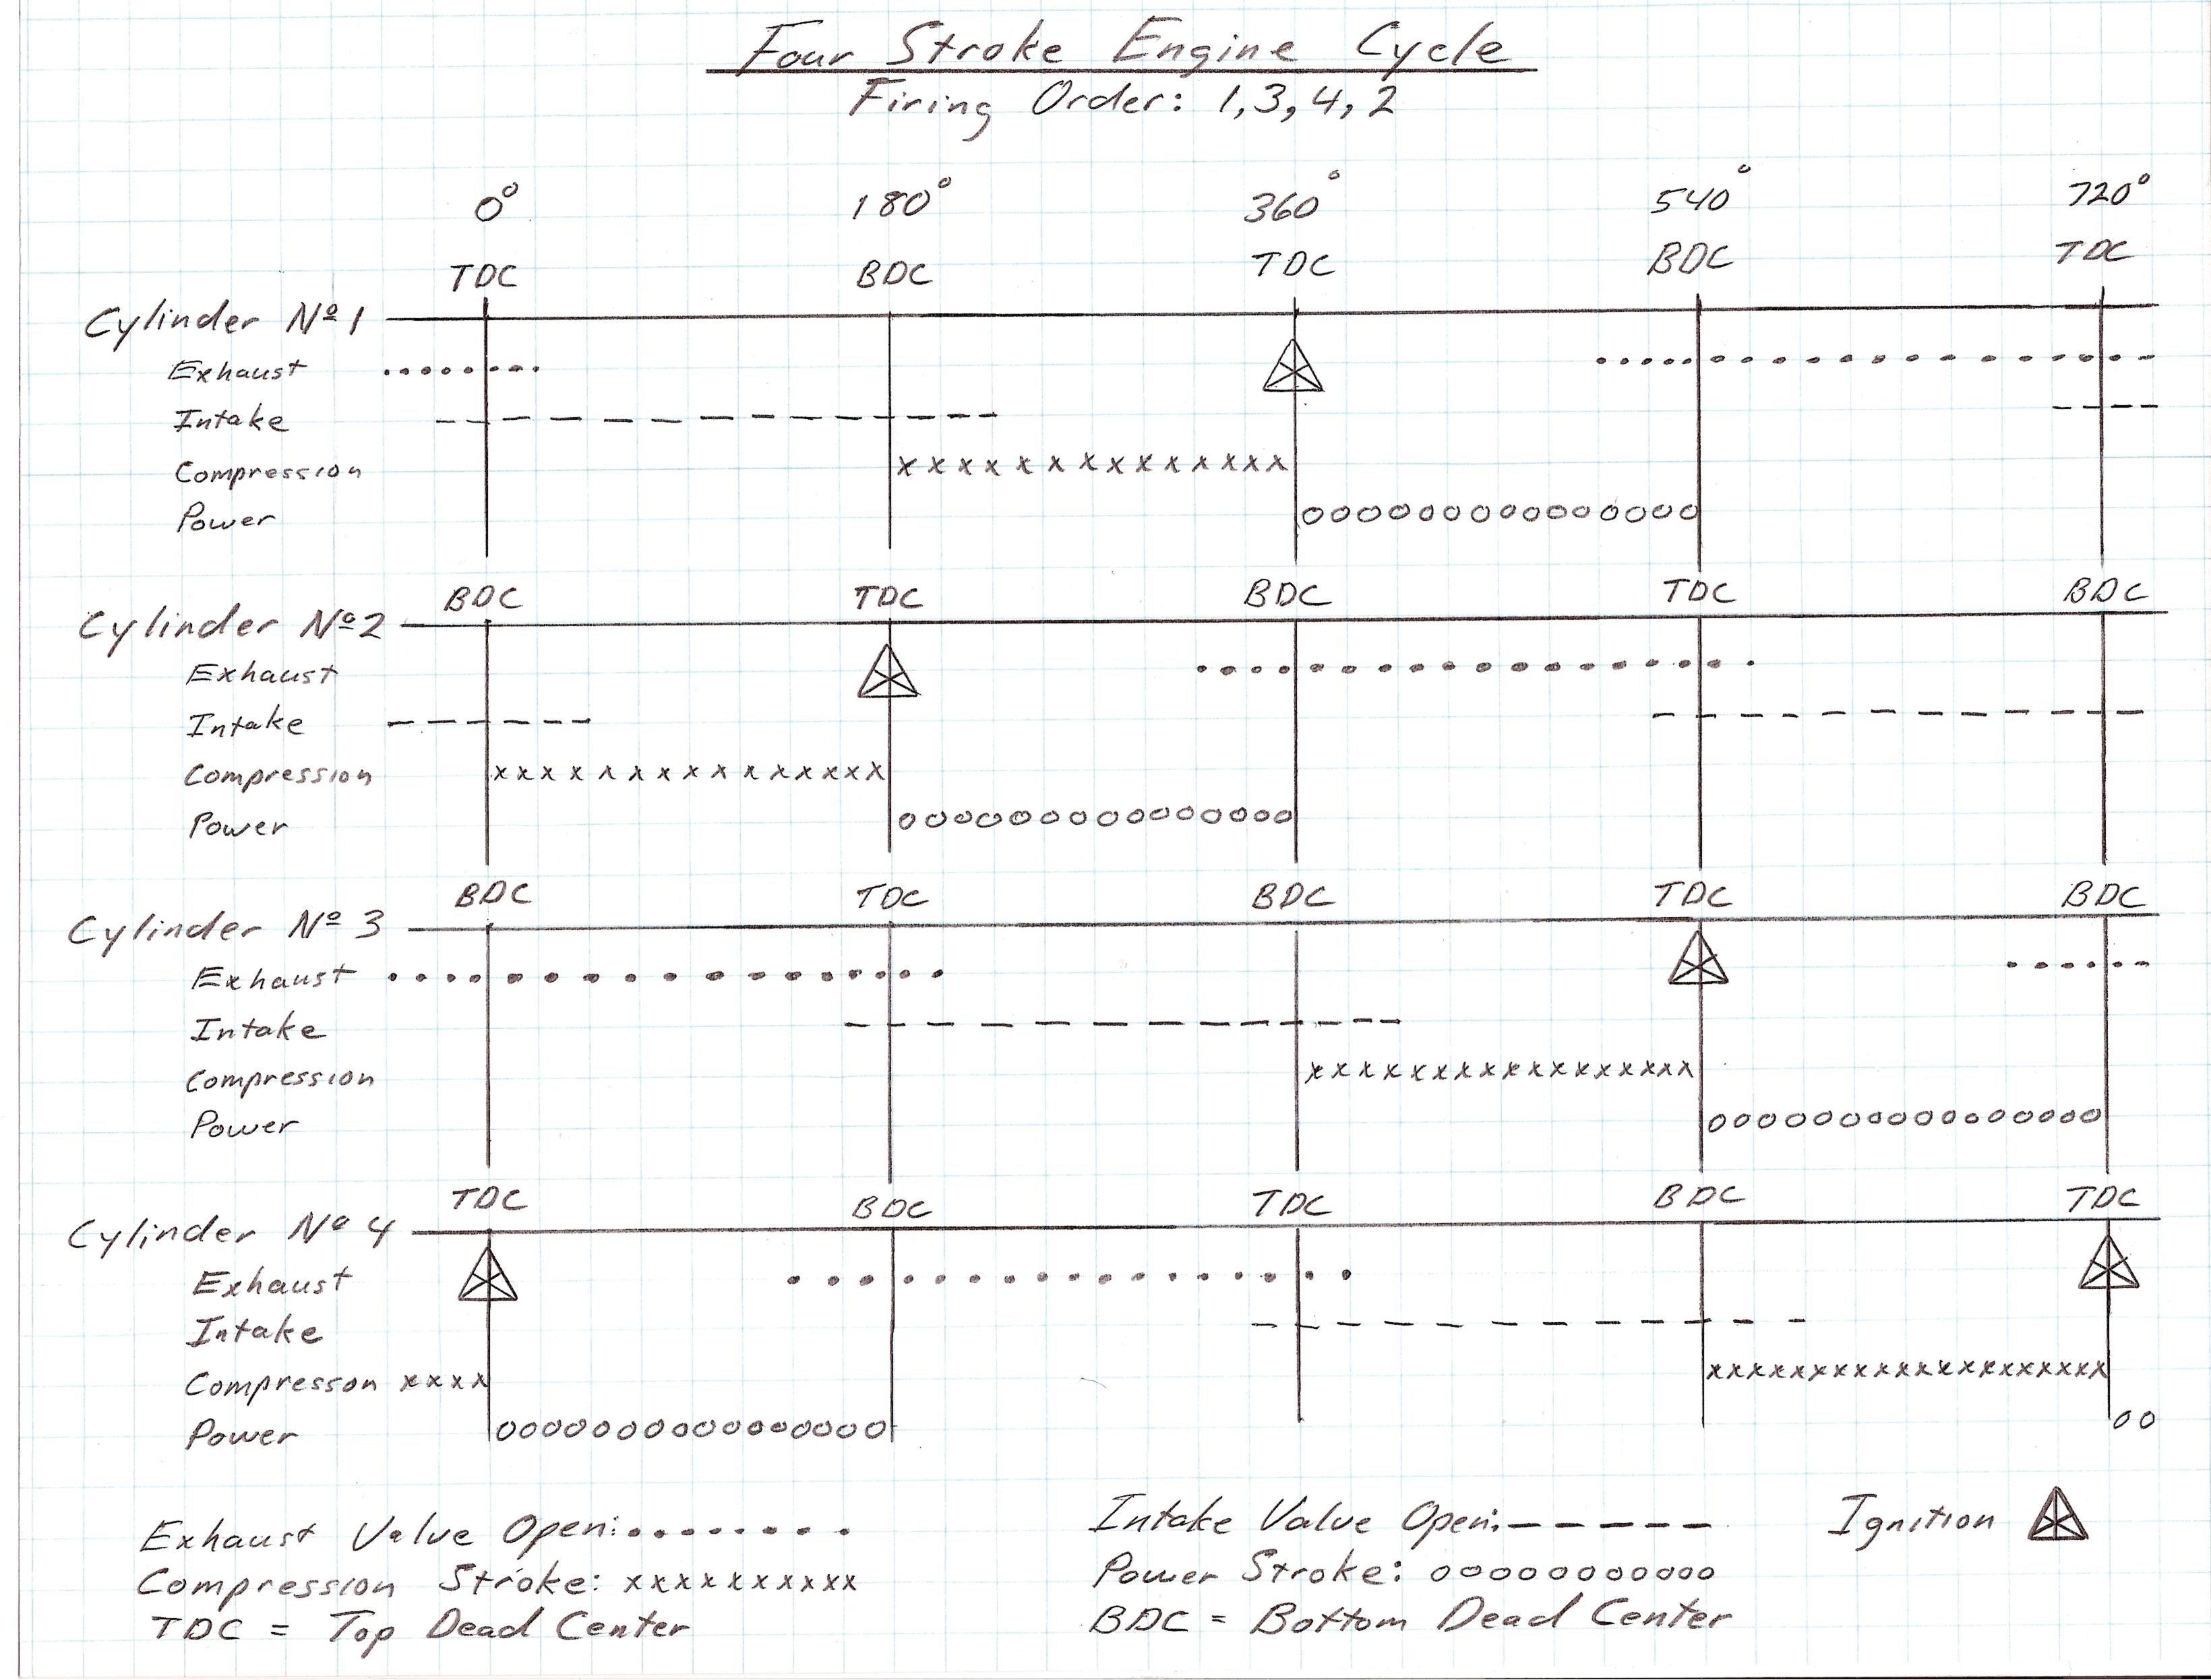 4 cylinder firing order diagram hq holden ignition wiring ford six html autos weblog